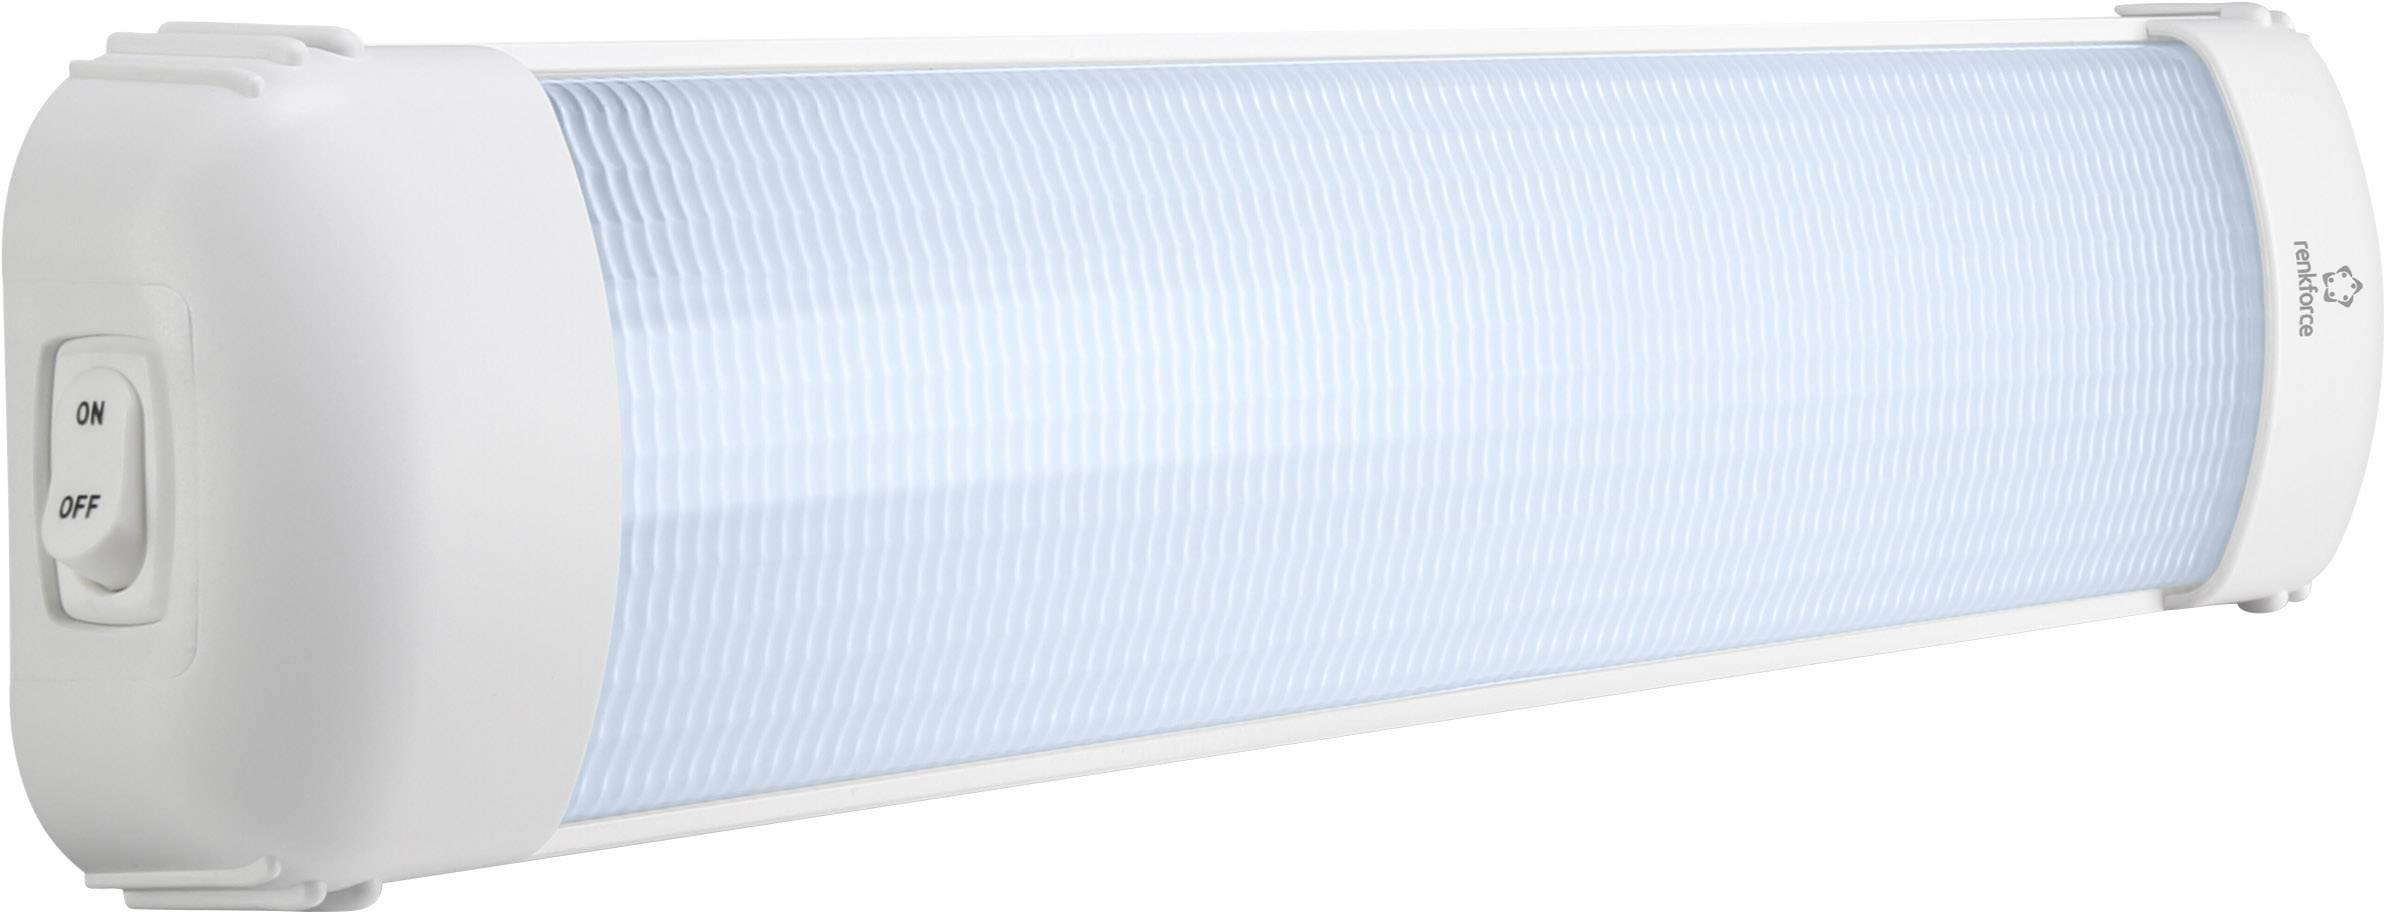 Vnútroné LED osvetlenie do auta Renkforce 1503017, 5.2 W, (š x v x h) 387 x 75 x 34 mm